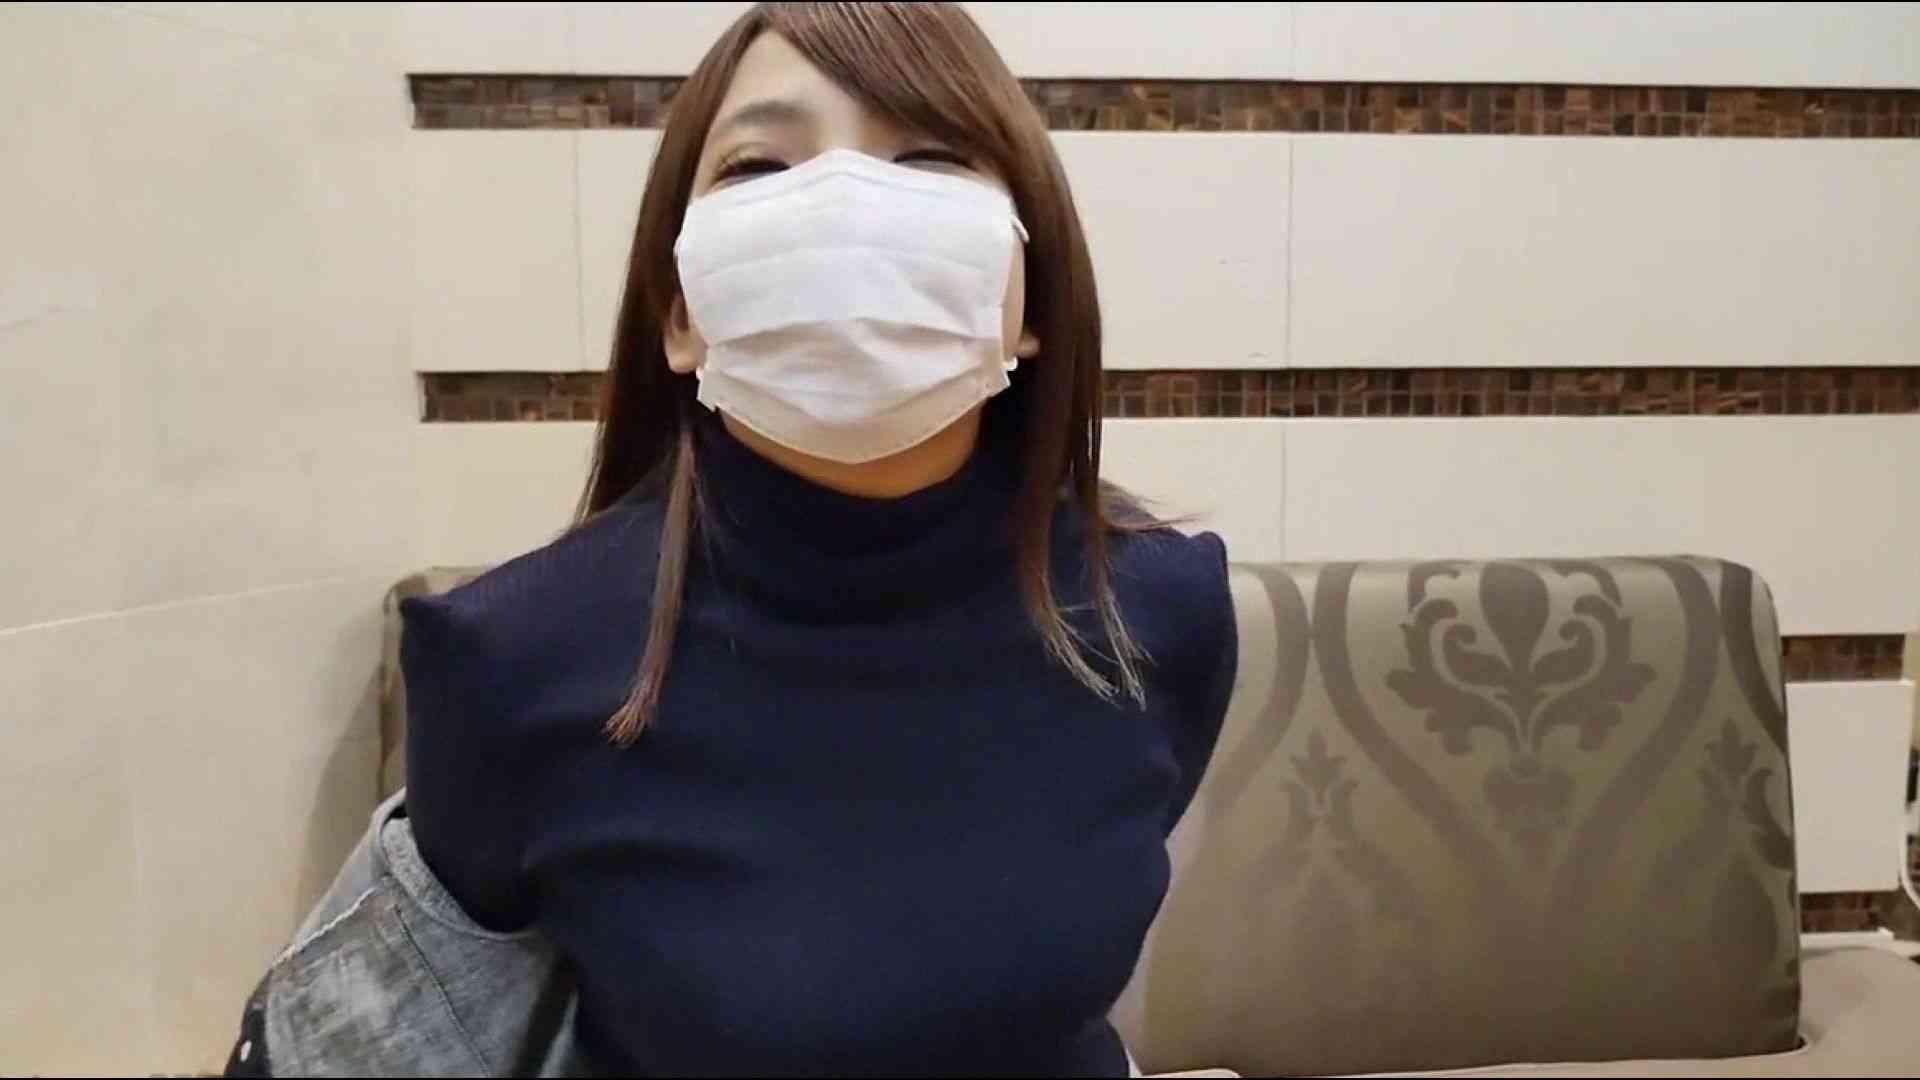 S級厳選美女ビッチガールVol.41 前編 モデル | 美女丸裸  99pic 31